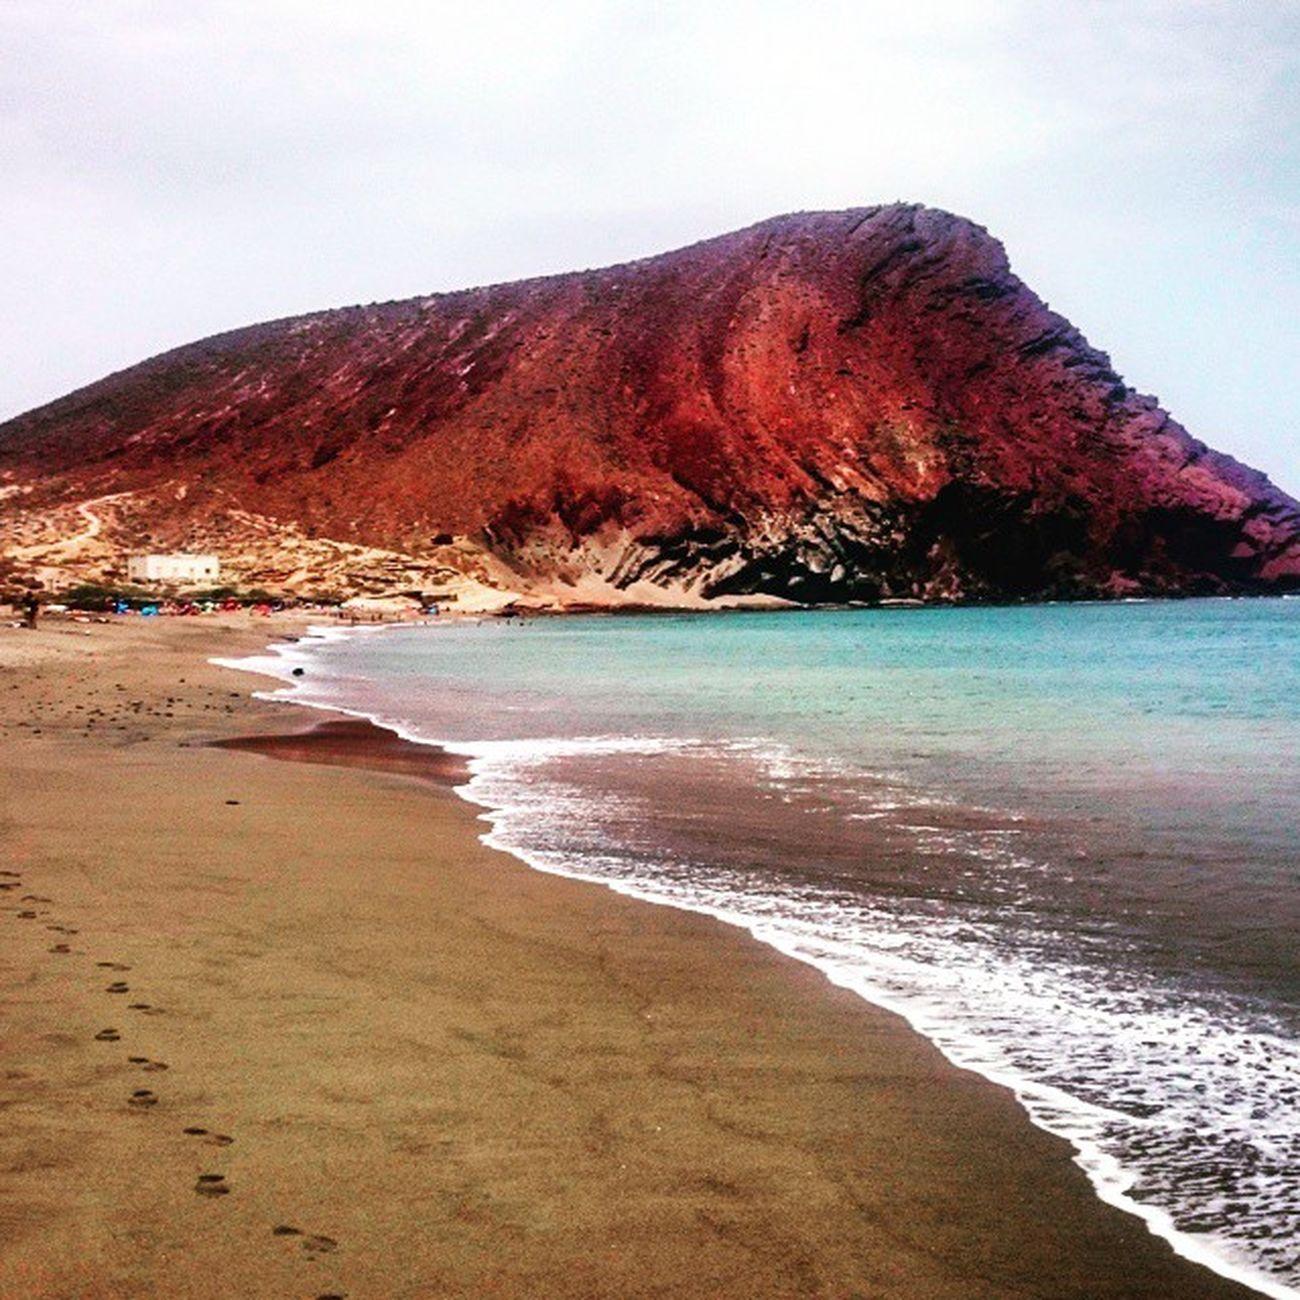 Latejita Elmedano Enjoyinglife  Love Exploring Tenerife Beachlife Canaryisland June 2015  Instagood Awesome Paradise Summer 2015  Happyholidays June SPAIN Europe